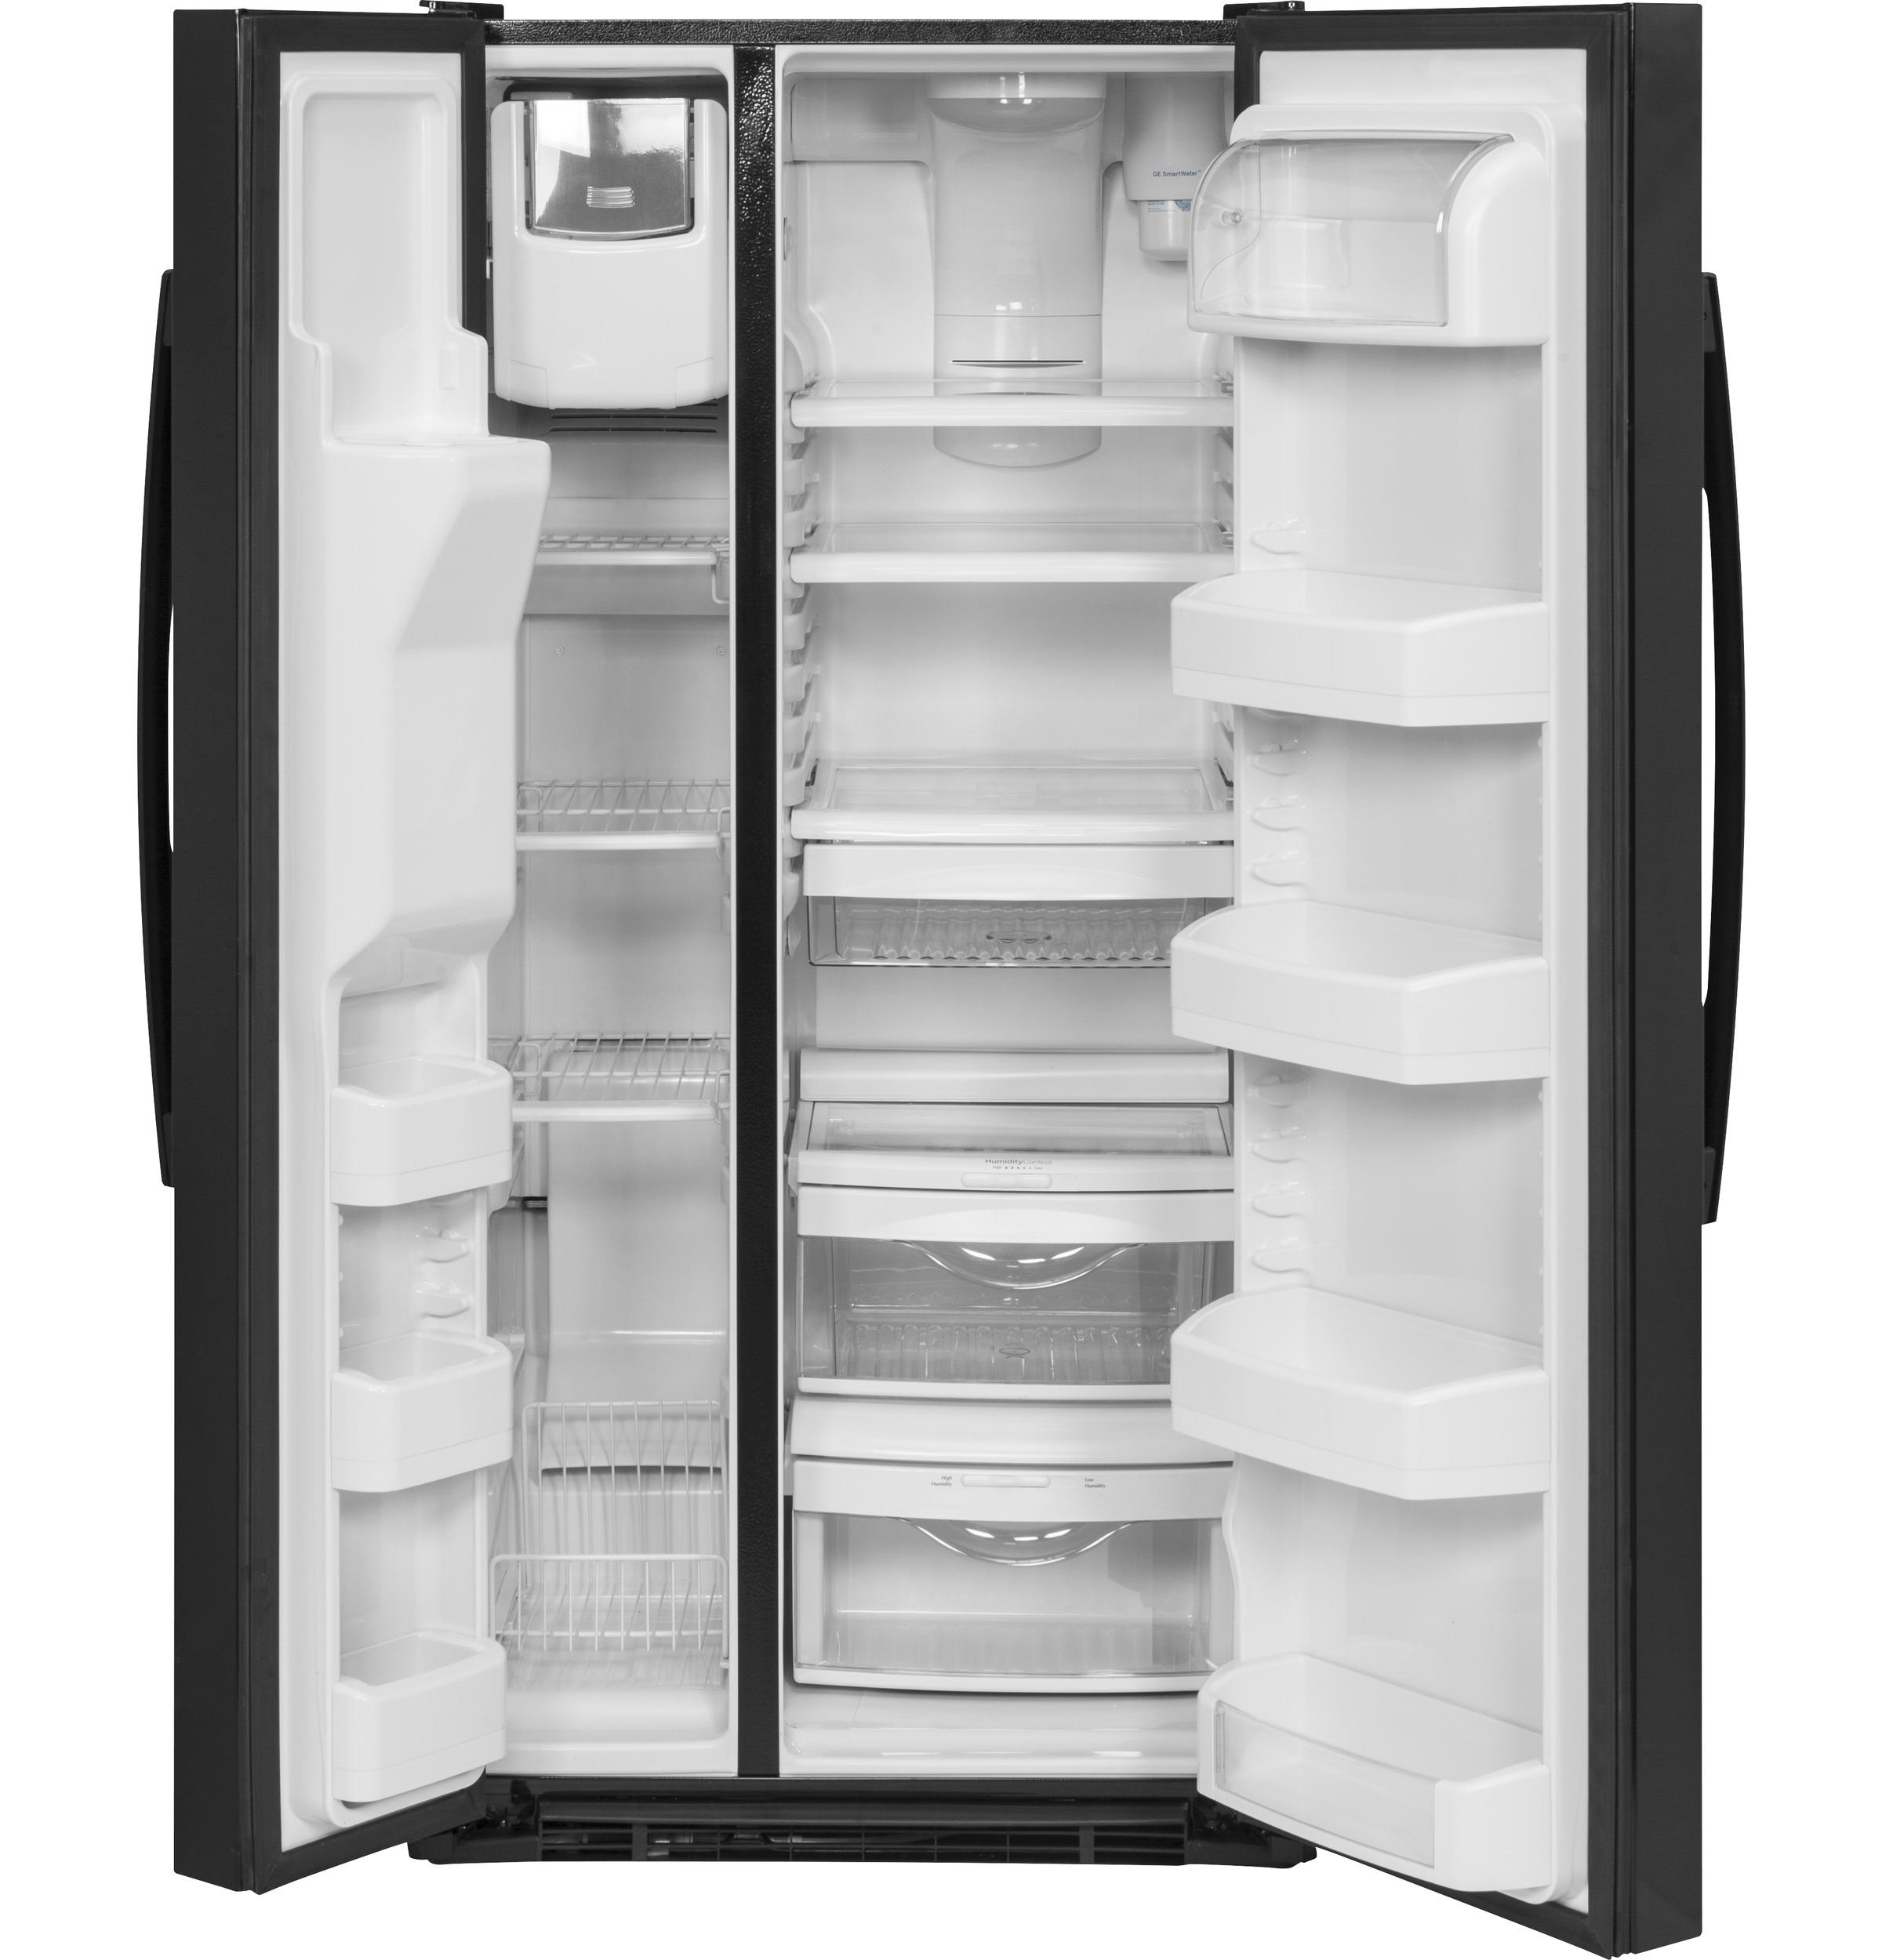 GE GE® 23.2 Cu. Ft. Side-By-Side Refrigerator